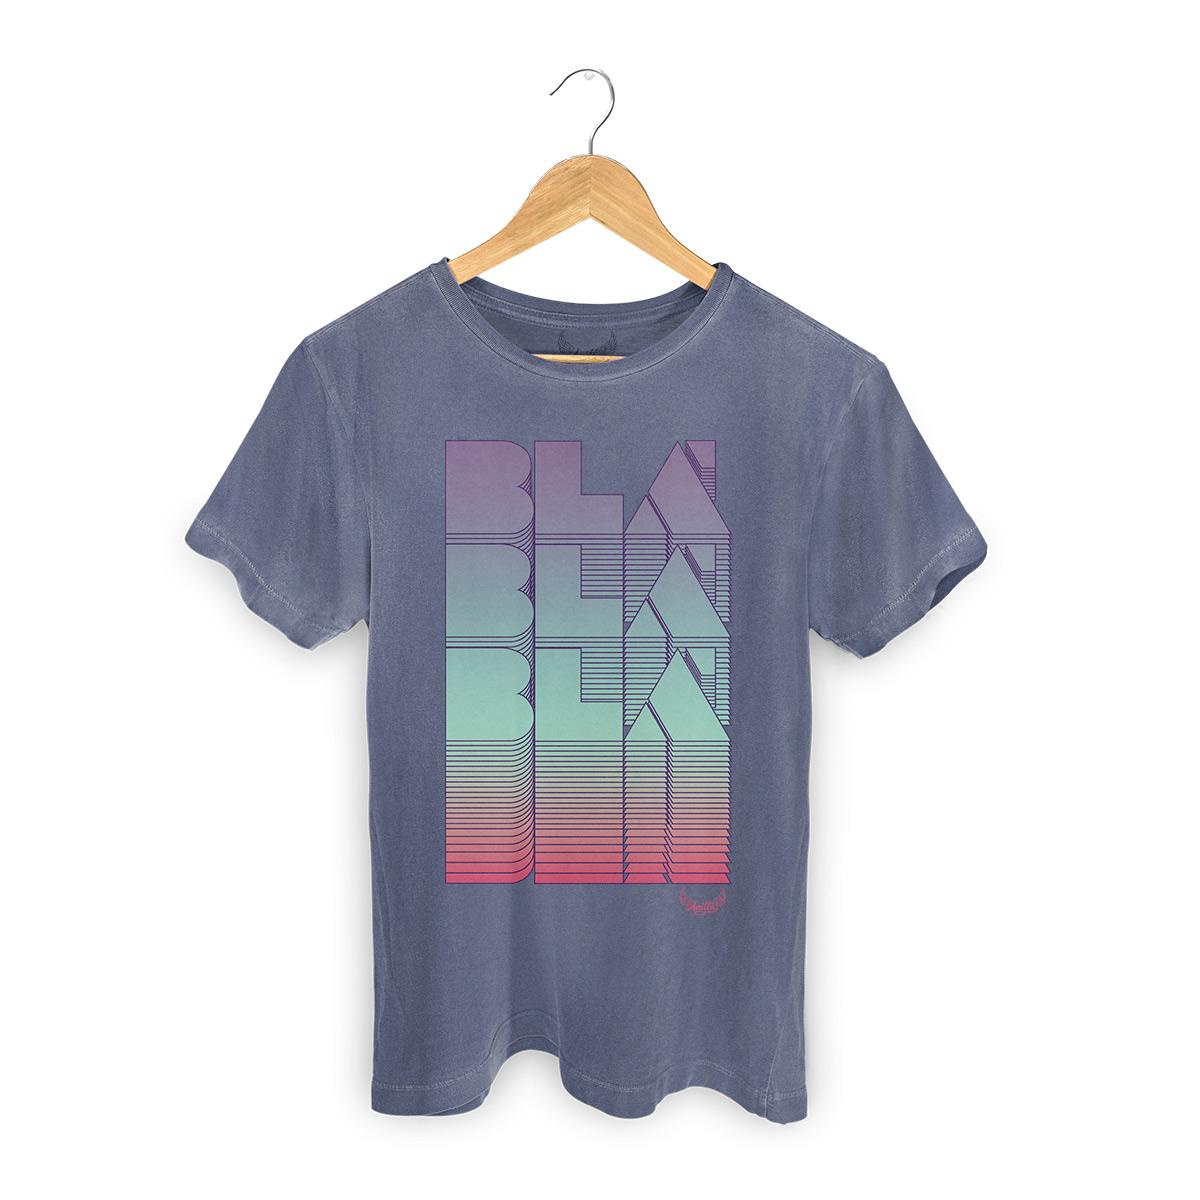 T-shirt Premium Masculina Anitta Blá Blá Blá